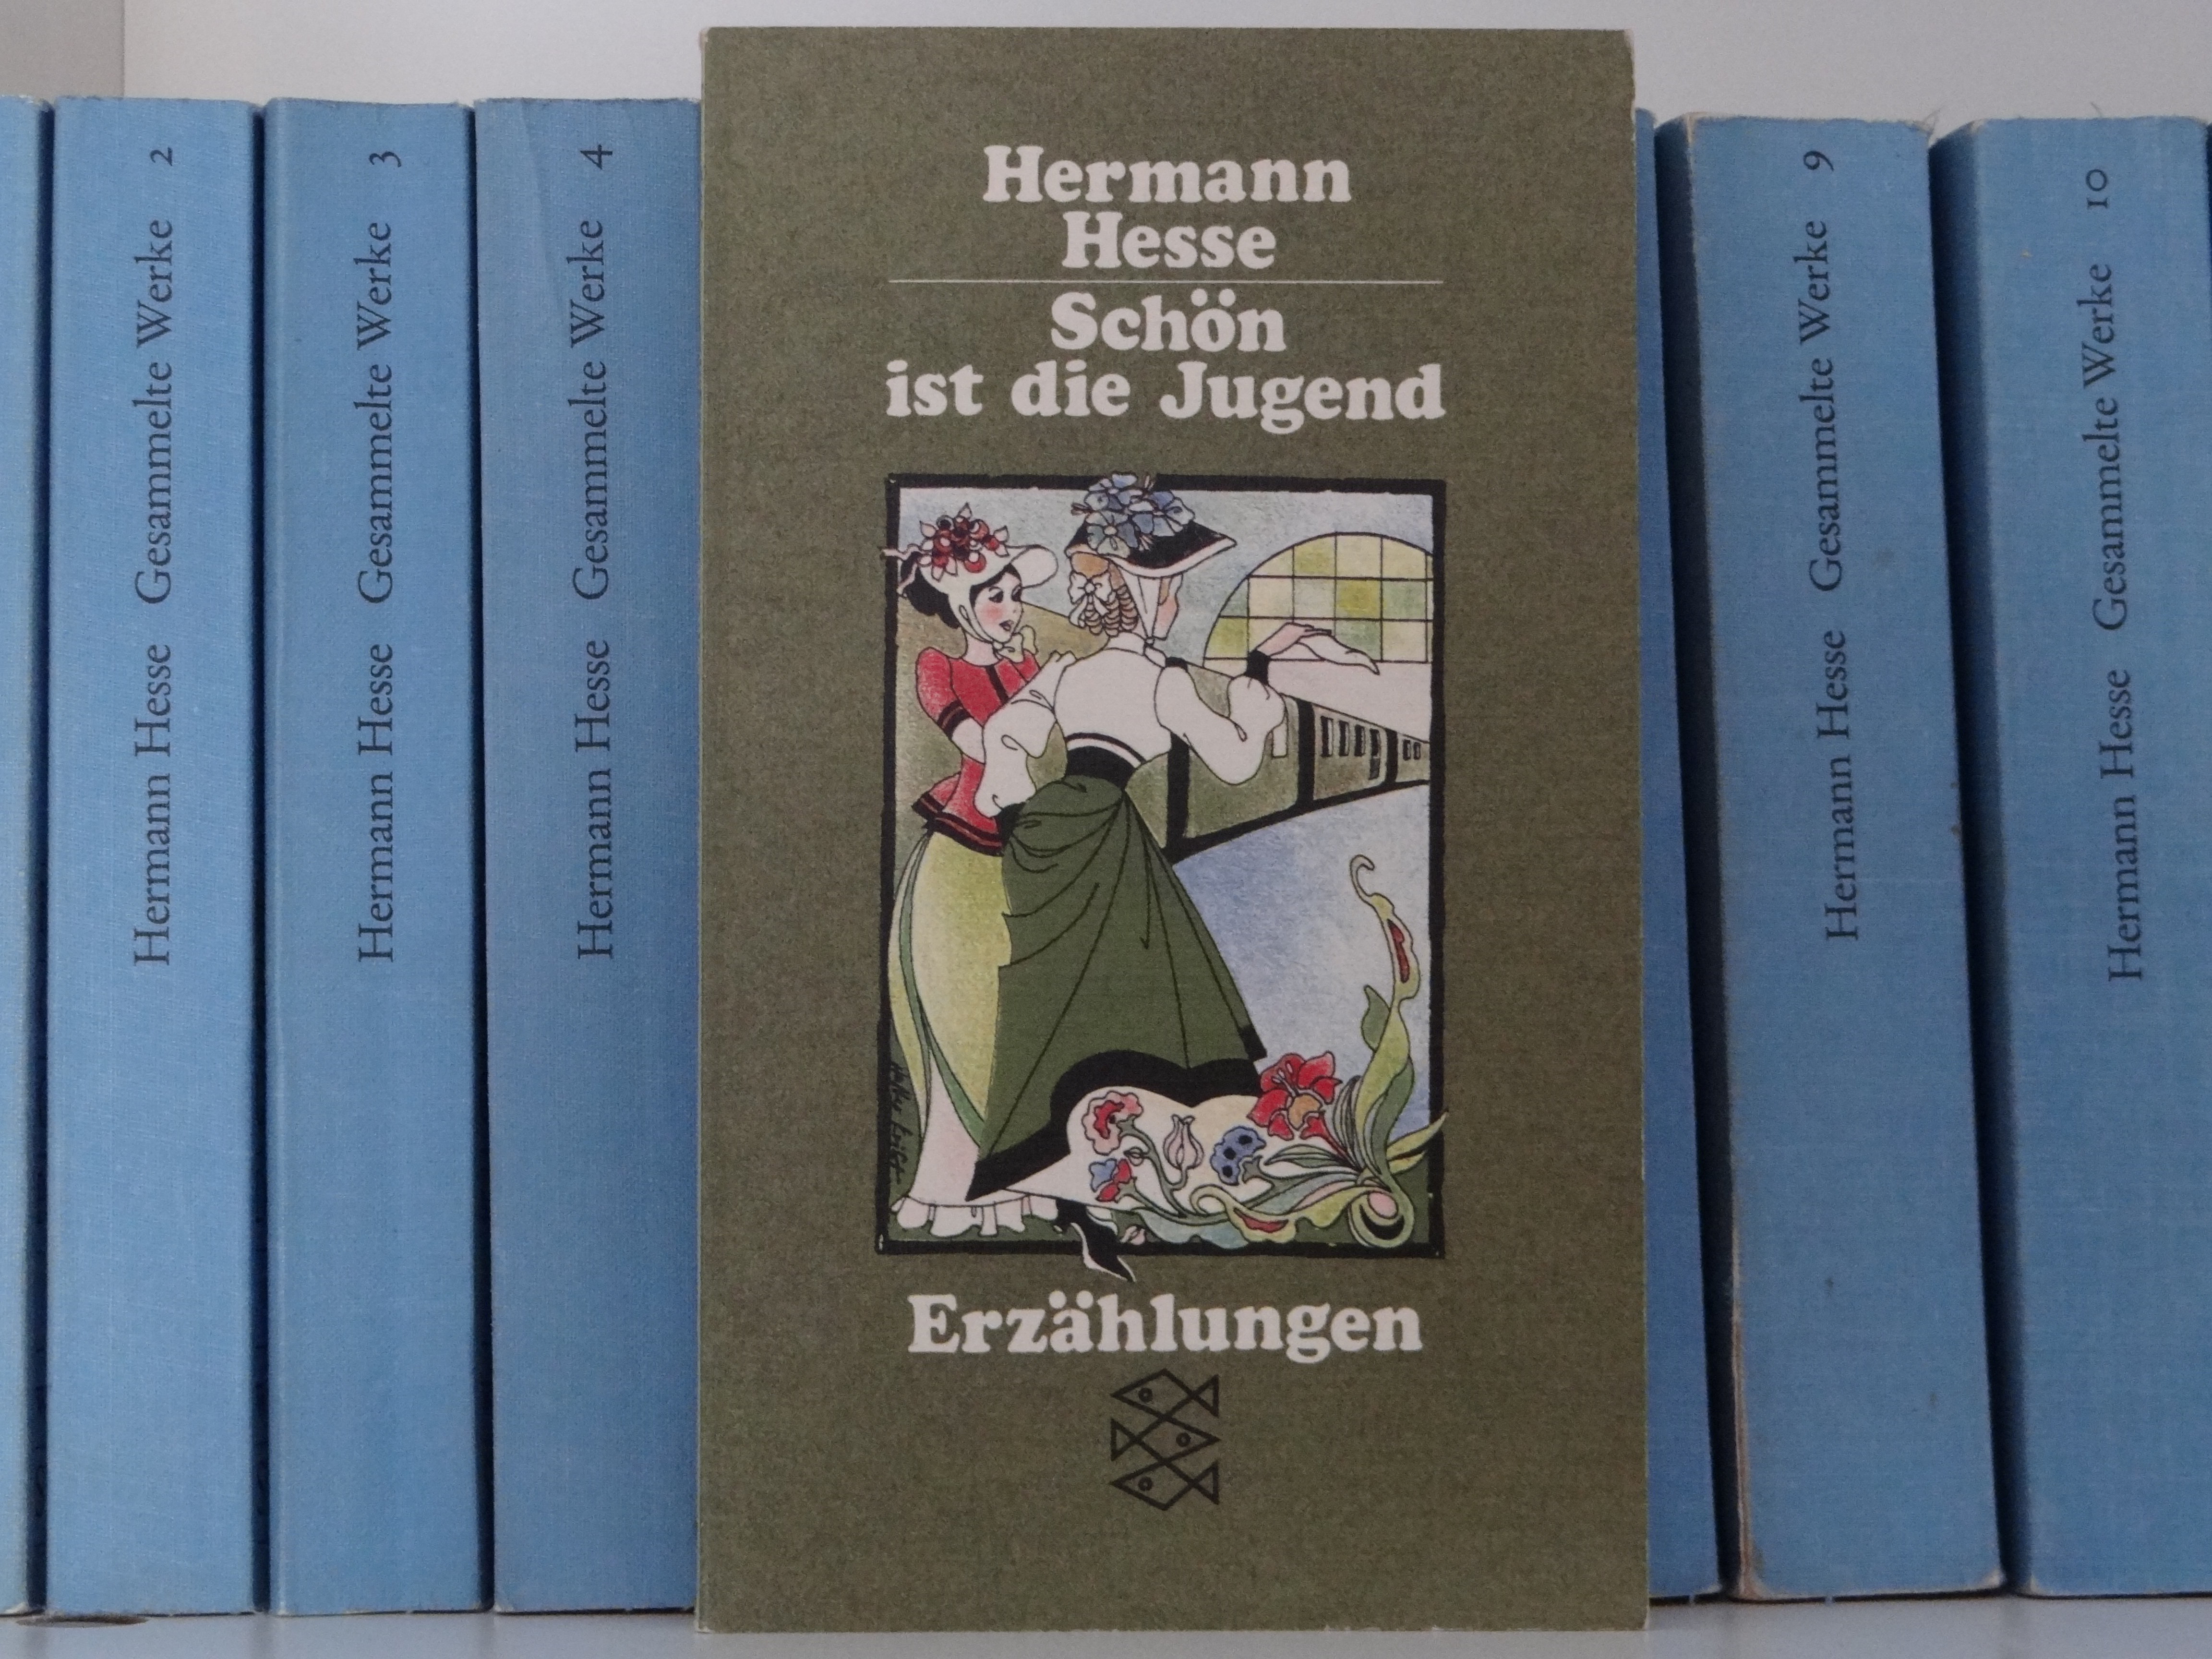 Hermann Hesse Weihnachten.Hermann Hesse C O N L I B R I